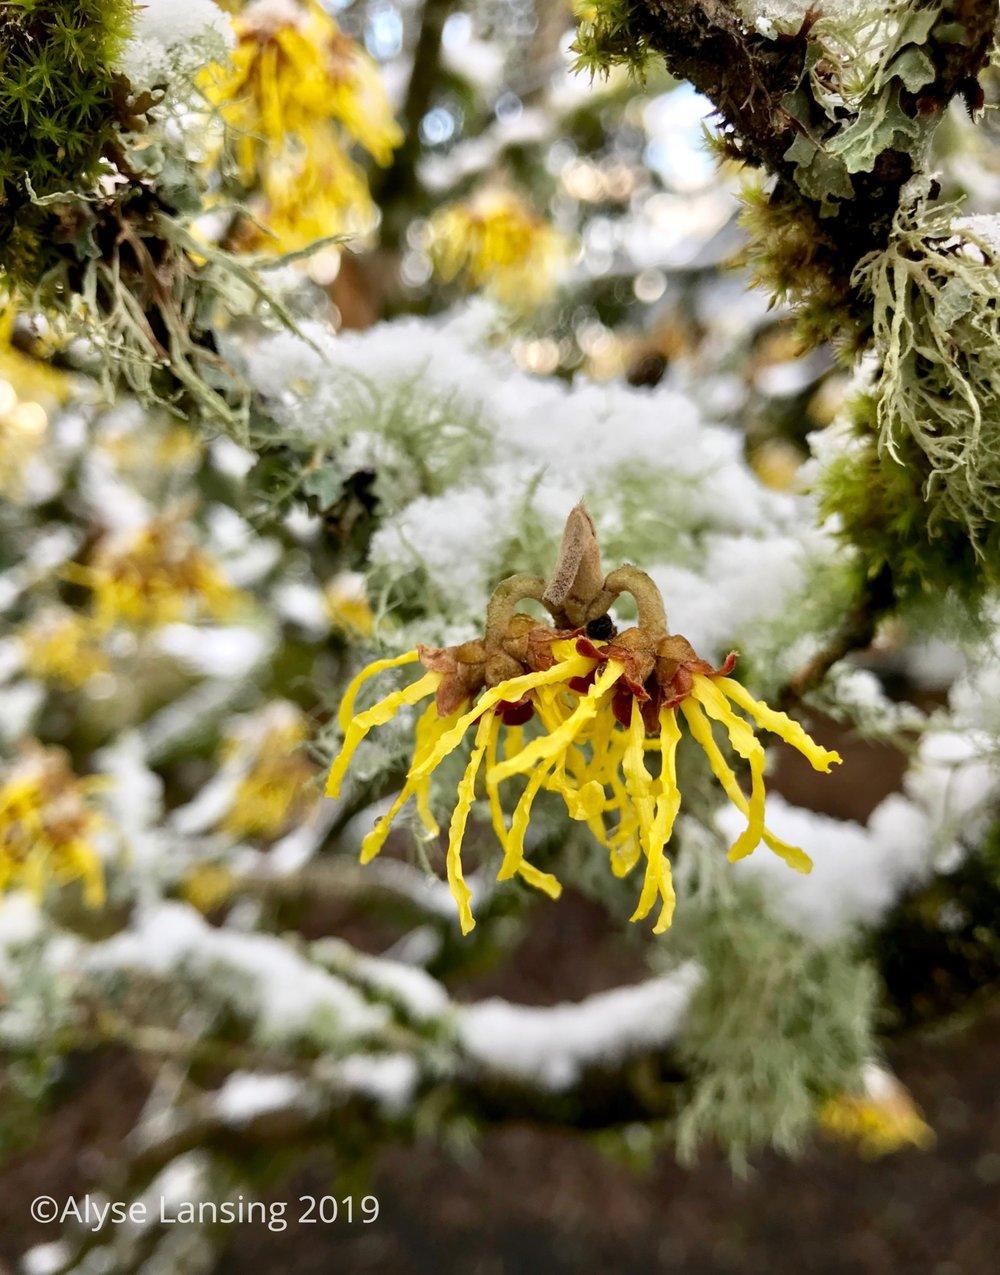 2019-02_Hamam_snow_AlyseLansing_sig.jpg